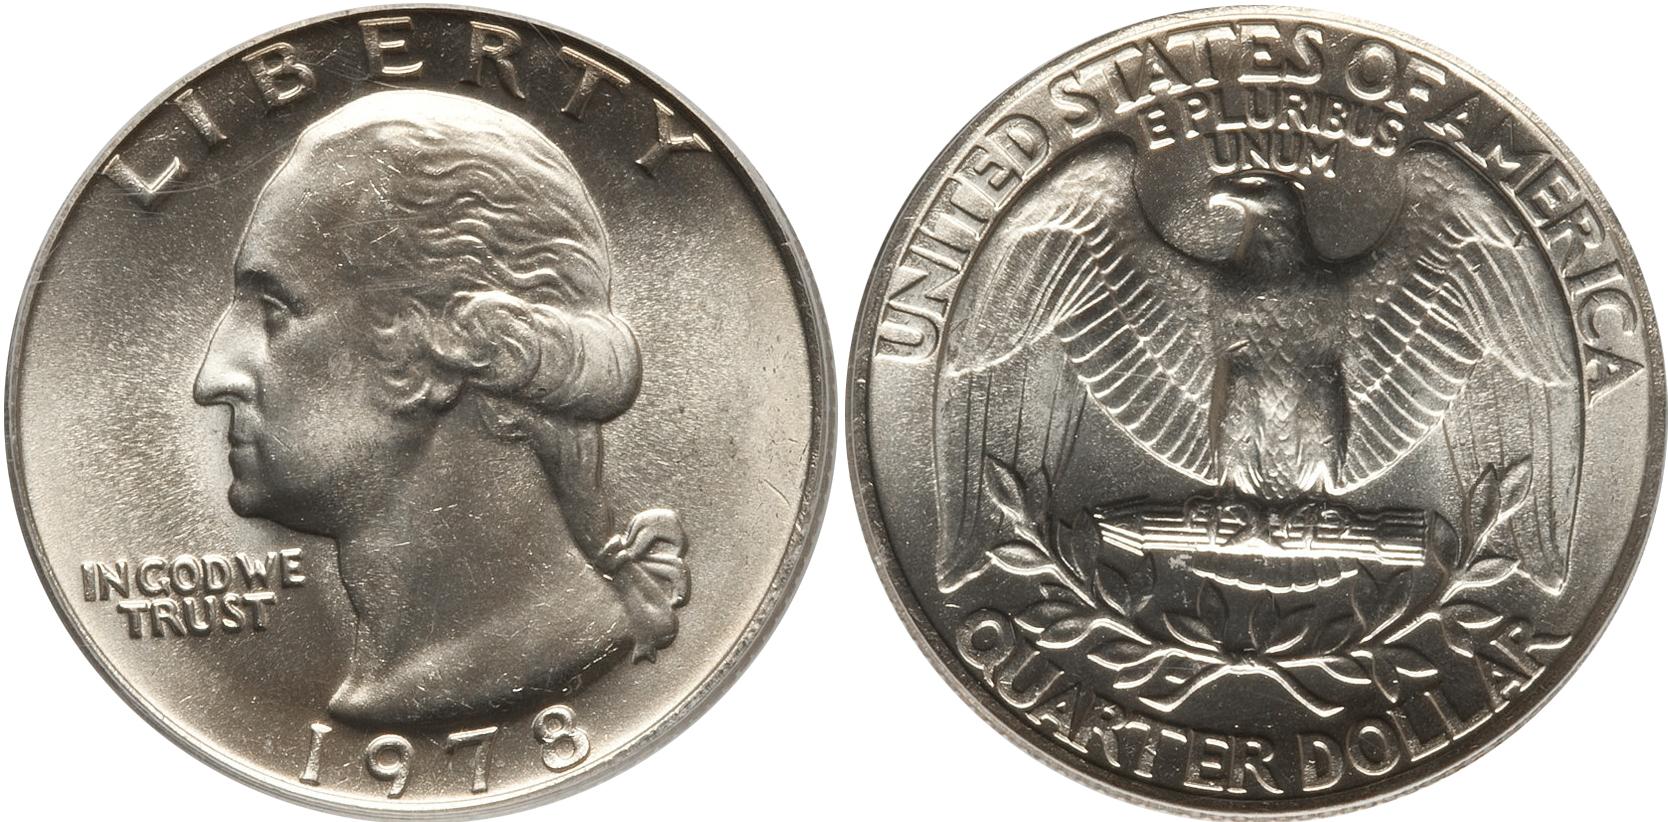 1978 Washington Quarter Value Coin Help